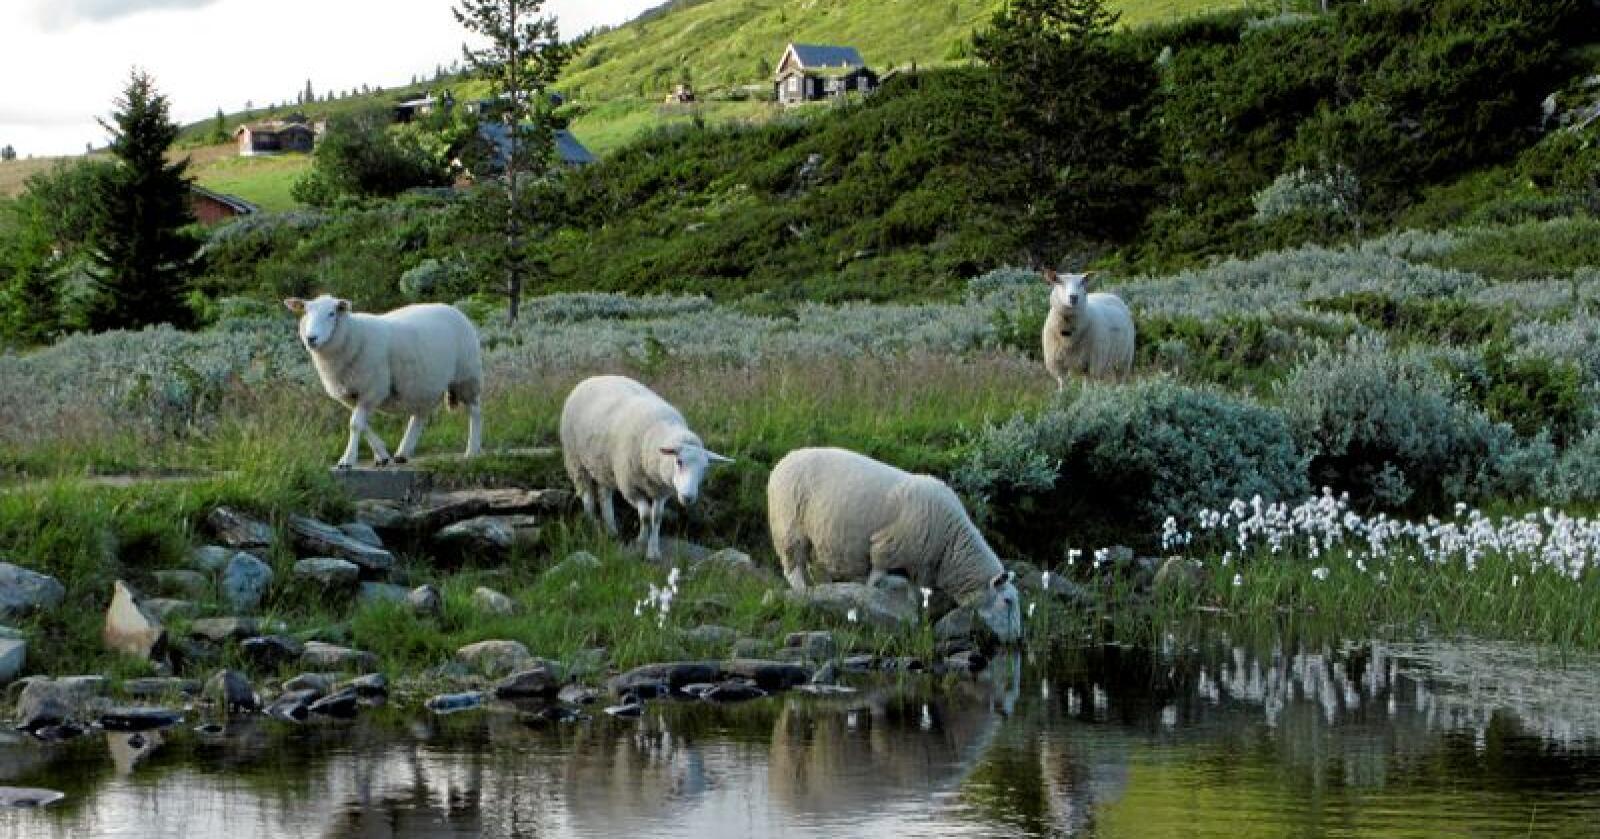 Utmarksbeite: Sau på fjellbeite i Gravdalen øst for Kvam i Gudbrandsdalen. Foto: Paul Kleiven / SCANPIX